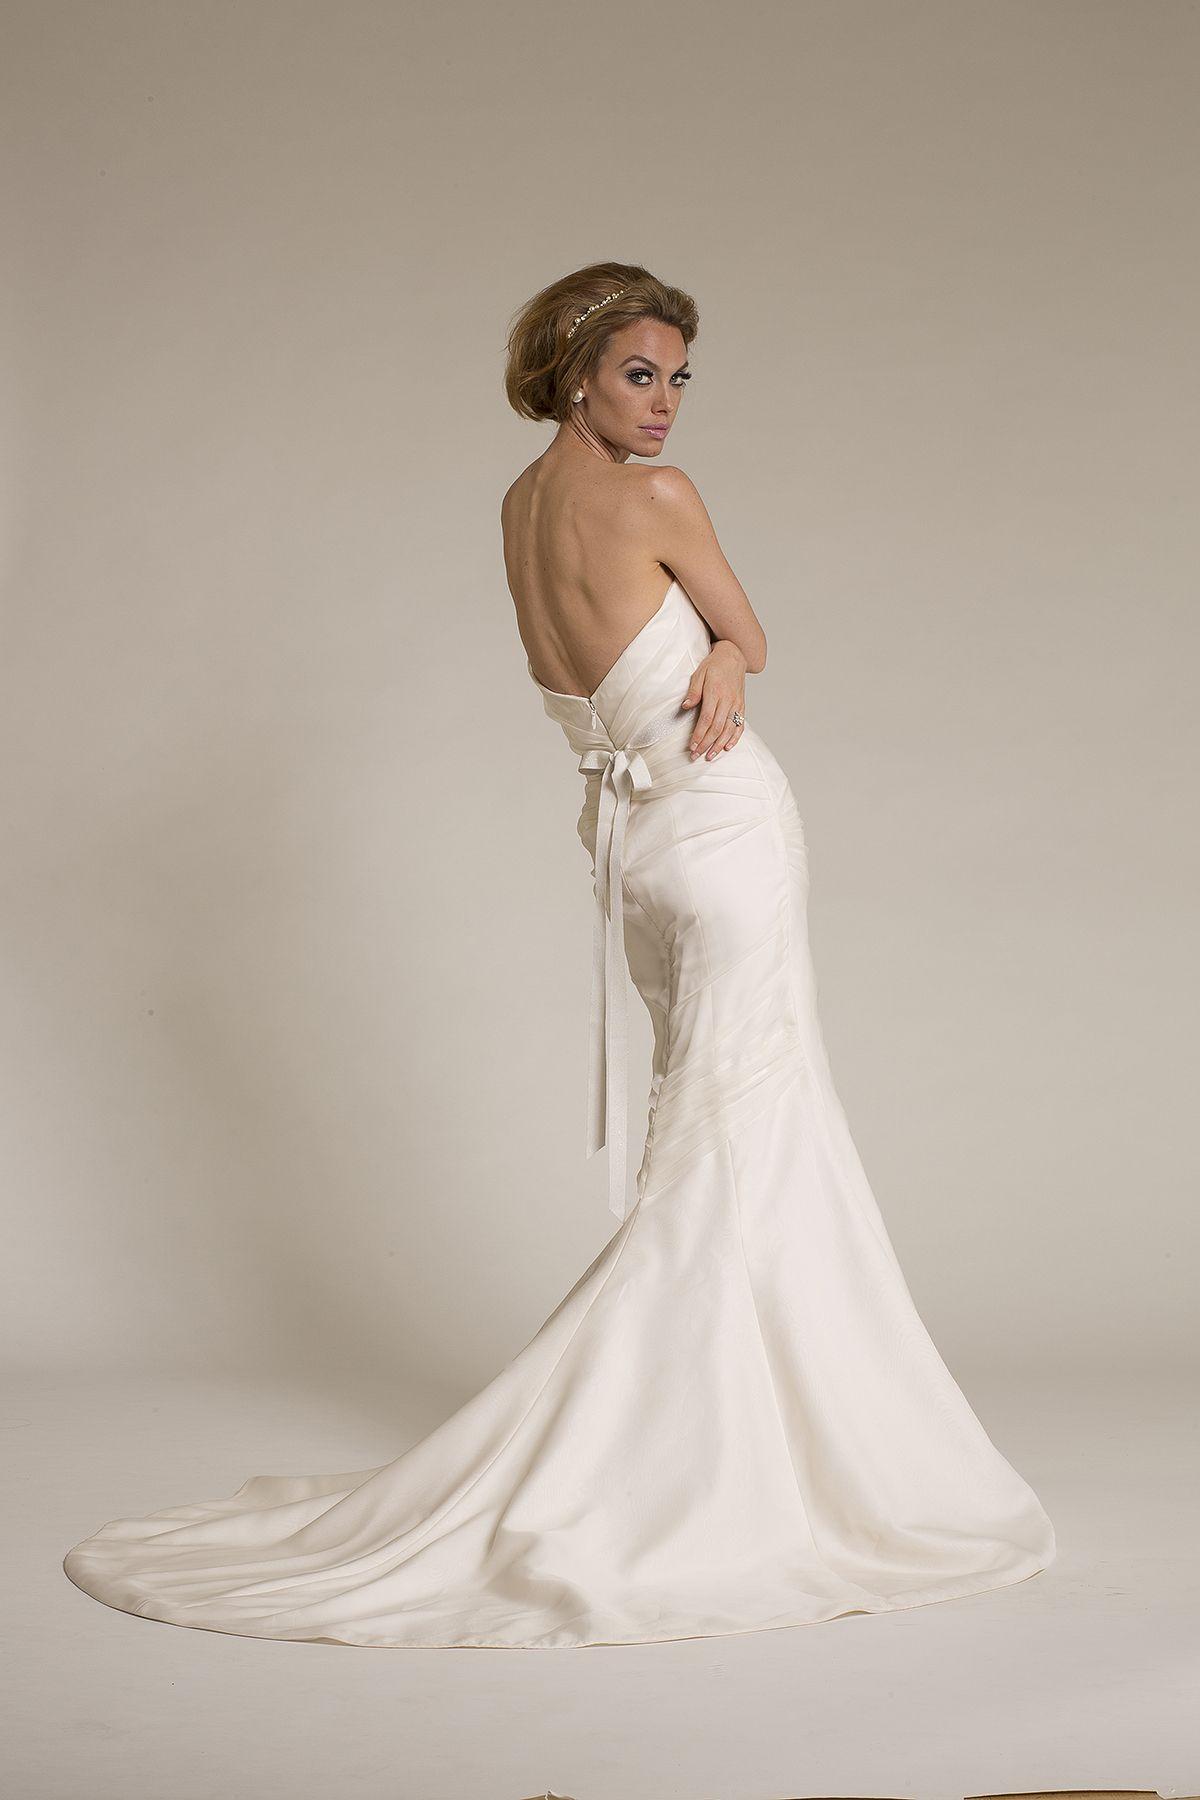 amy kuschel bride sugar wedding gown back view with barcelona sash